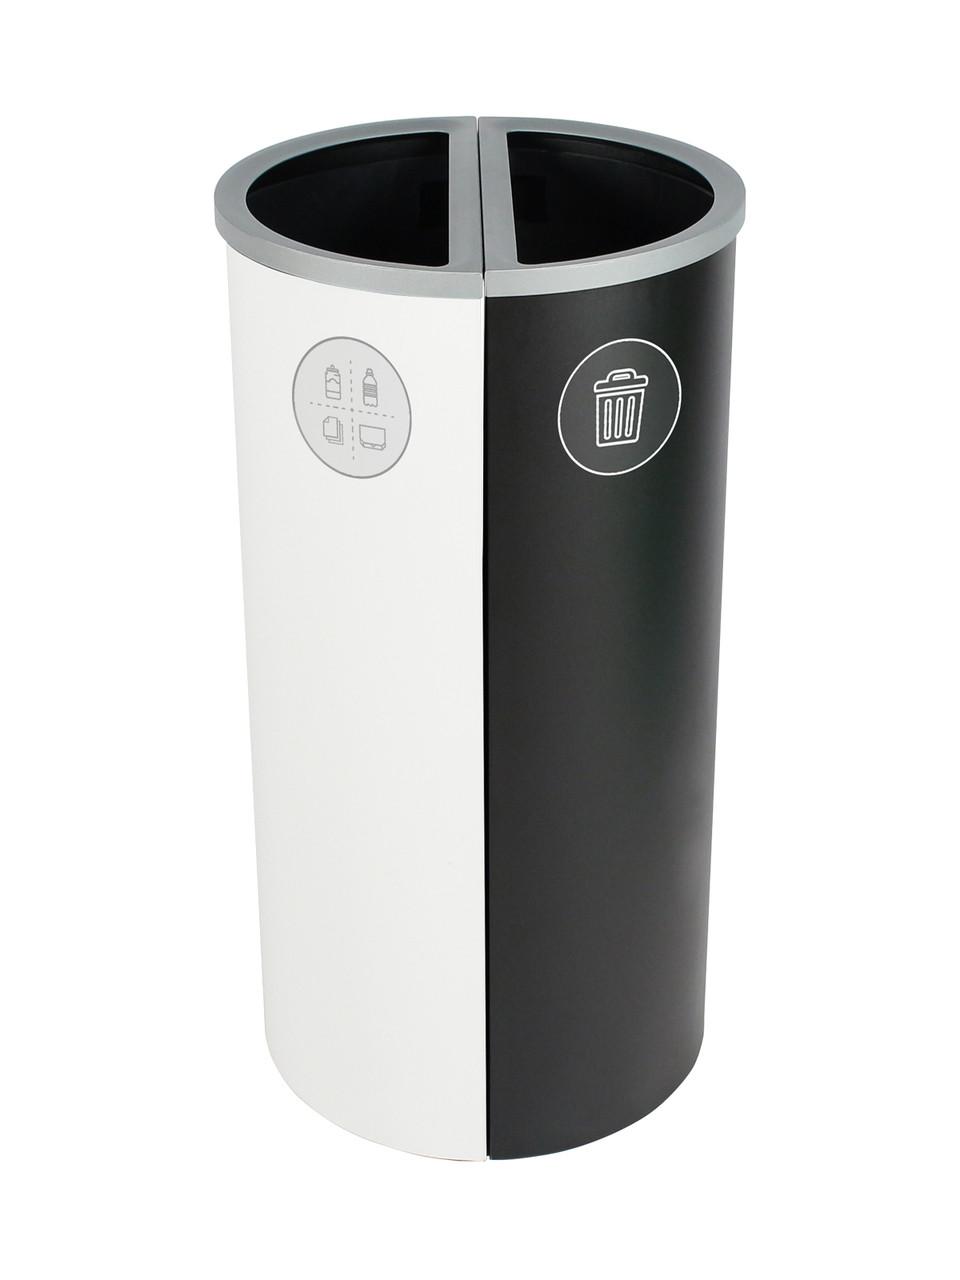 16 Gallon Spectrum Round Trash Can & Recycle Bin White/Black 8107086-24